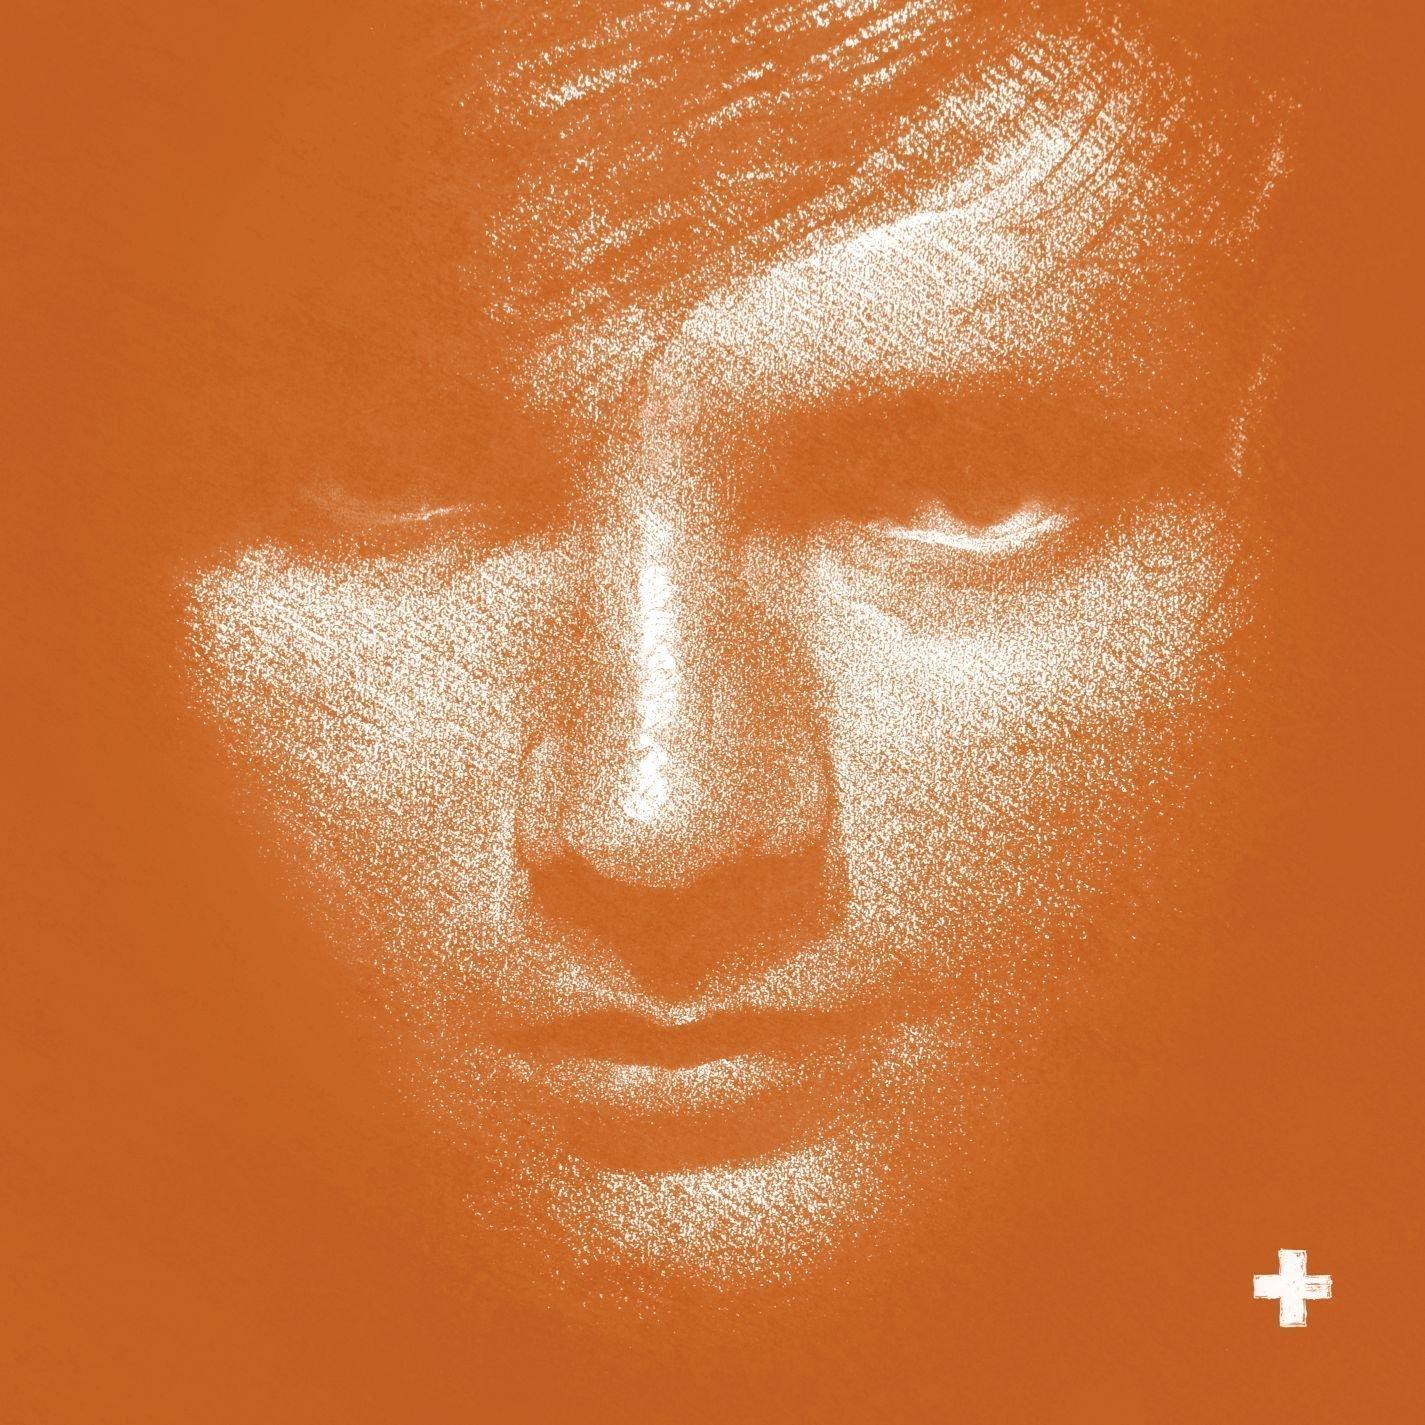 Ed Sheeran + (Vinyl LP) Miss Sixty